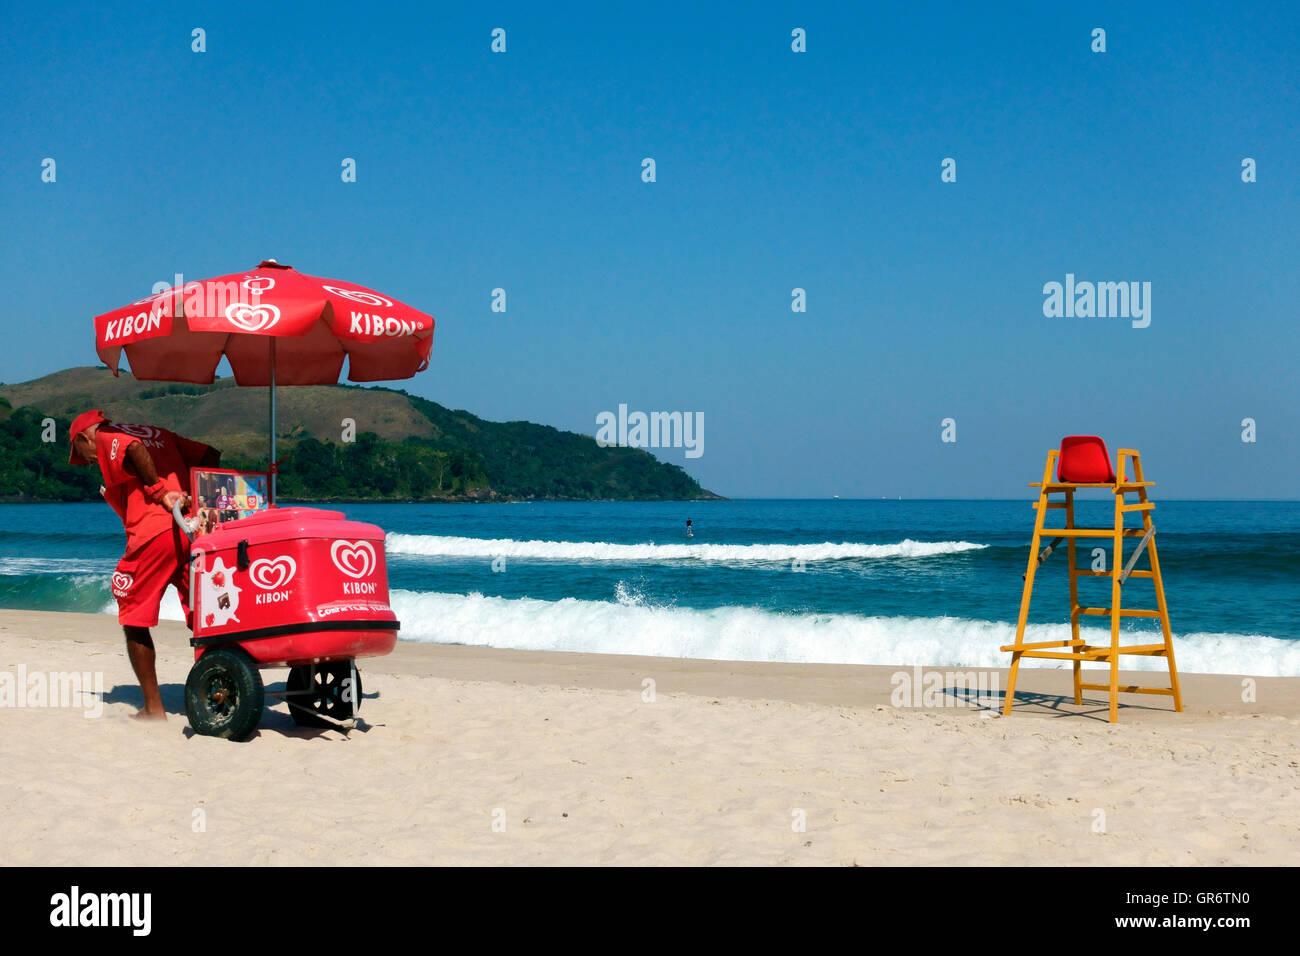 Ice cream seller on Maresias beach in Brazil - Stock Image